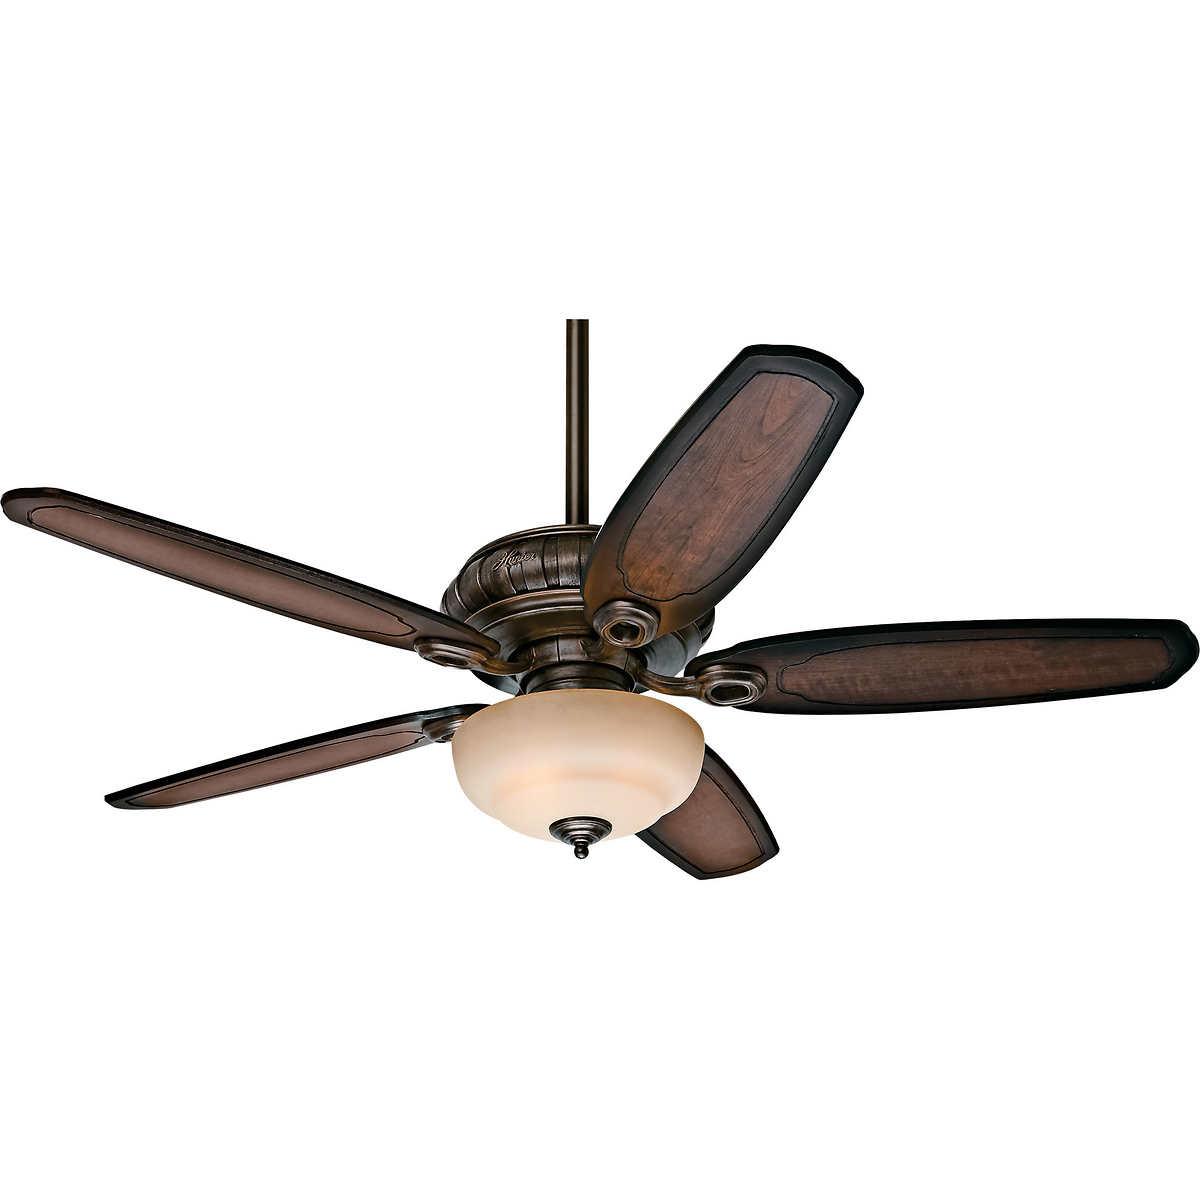 "hunter avia 54"" led indoor ceiling fan"